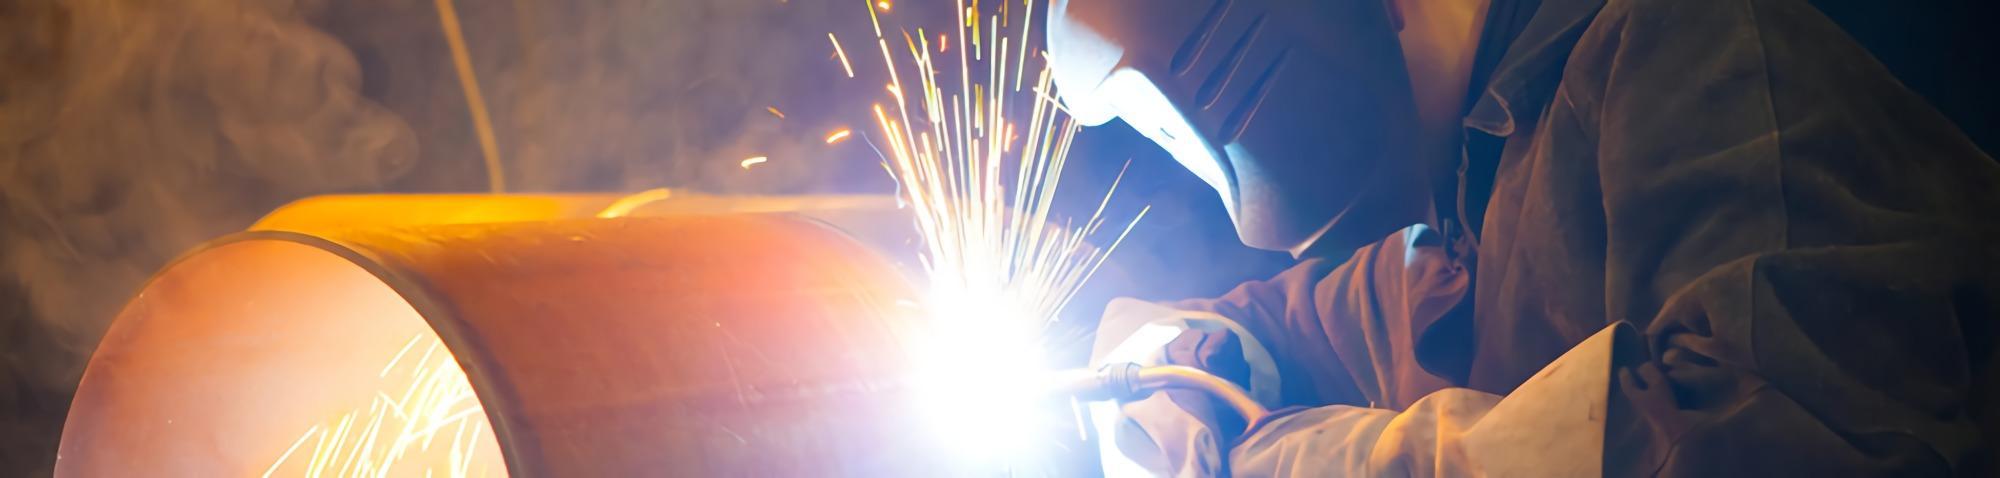 Welder Training Arc Welding